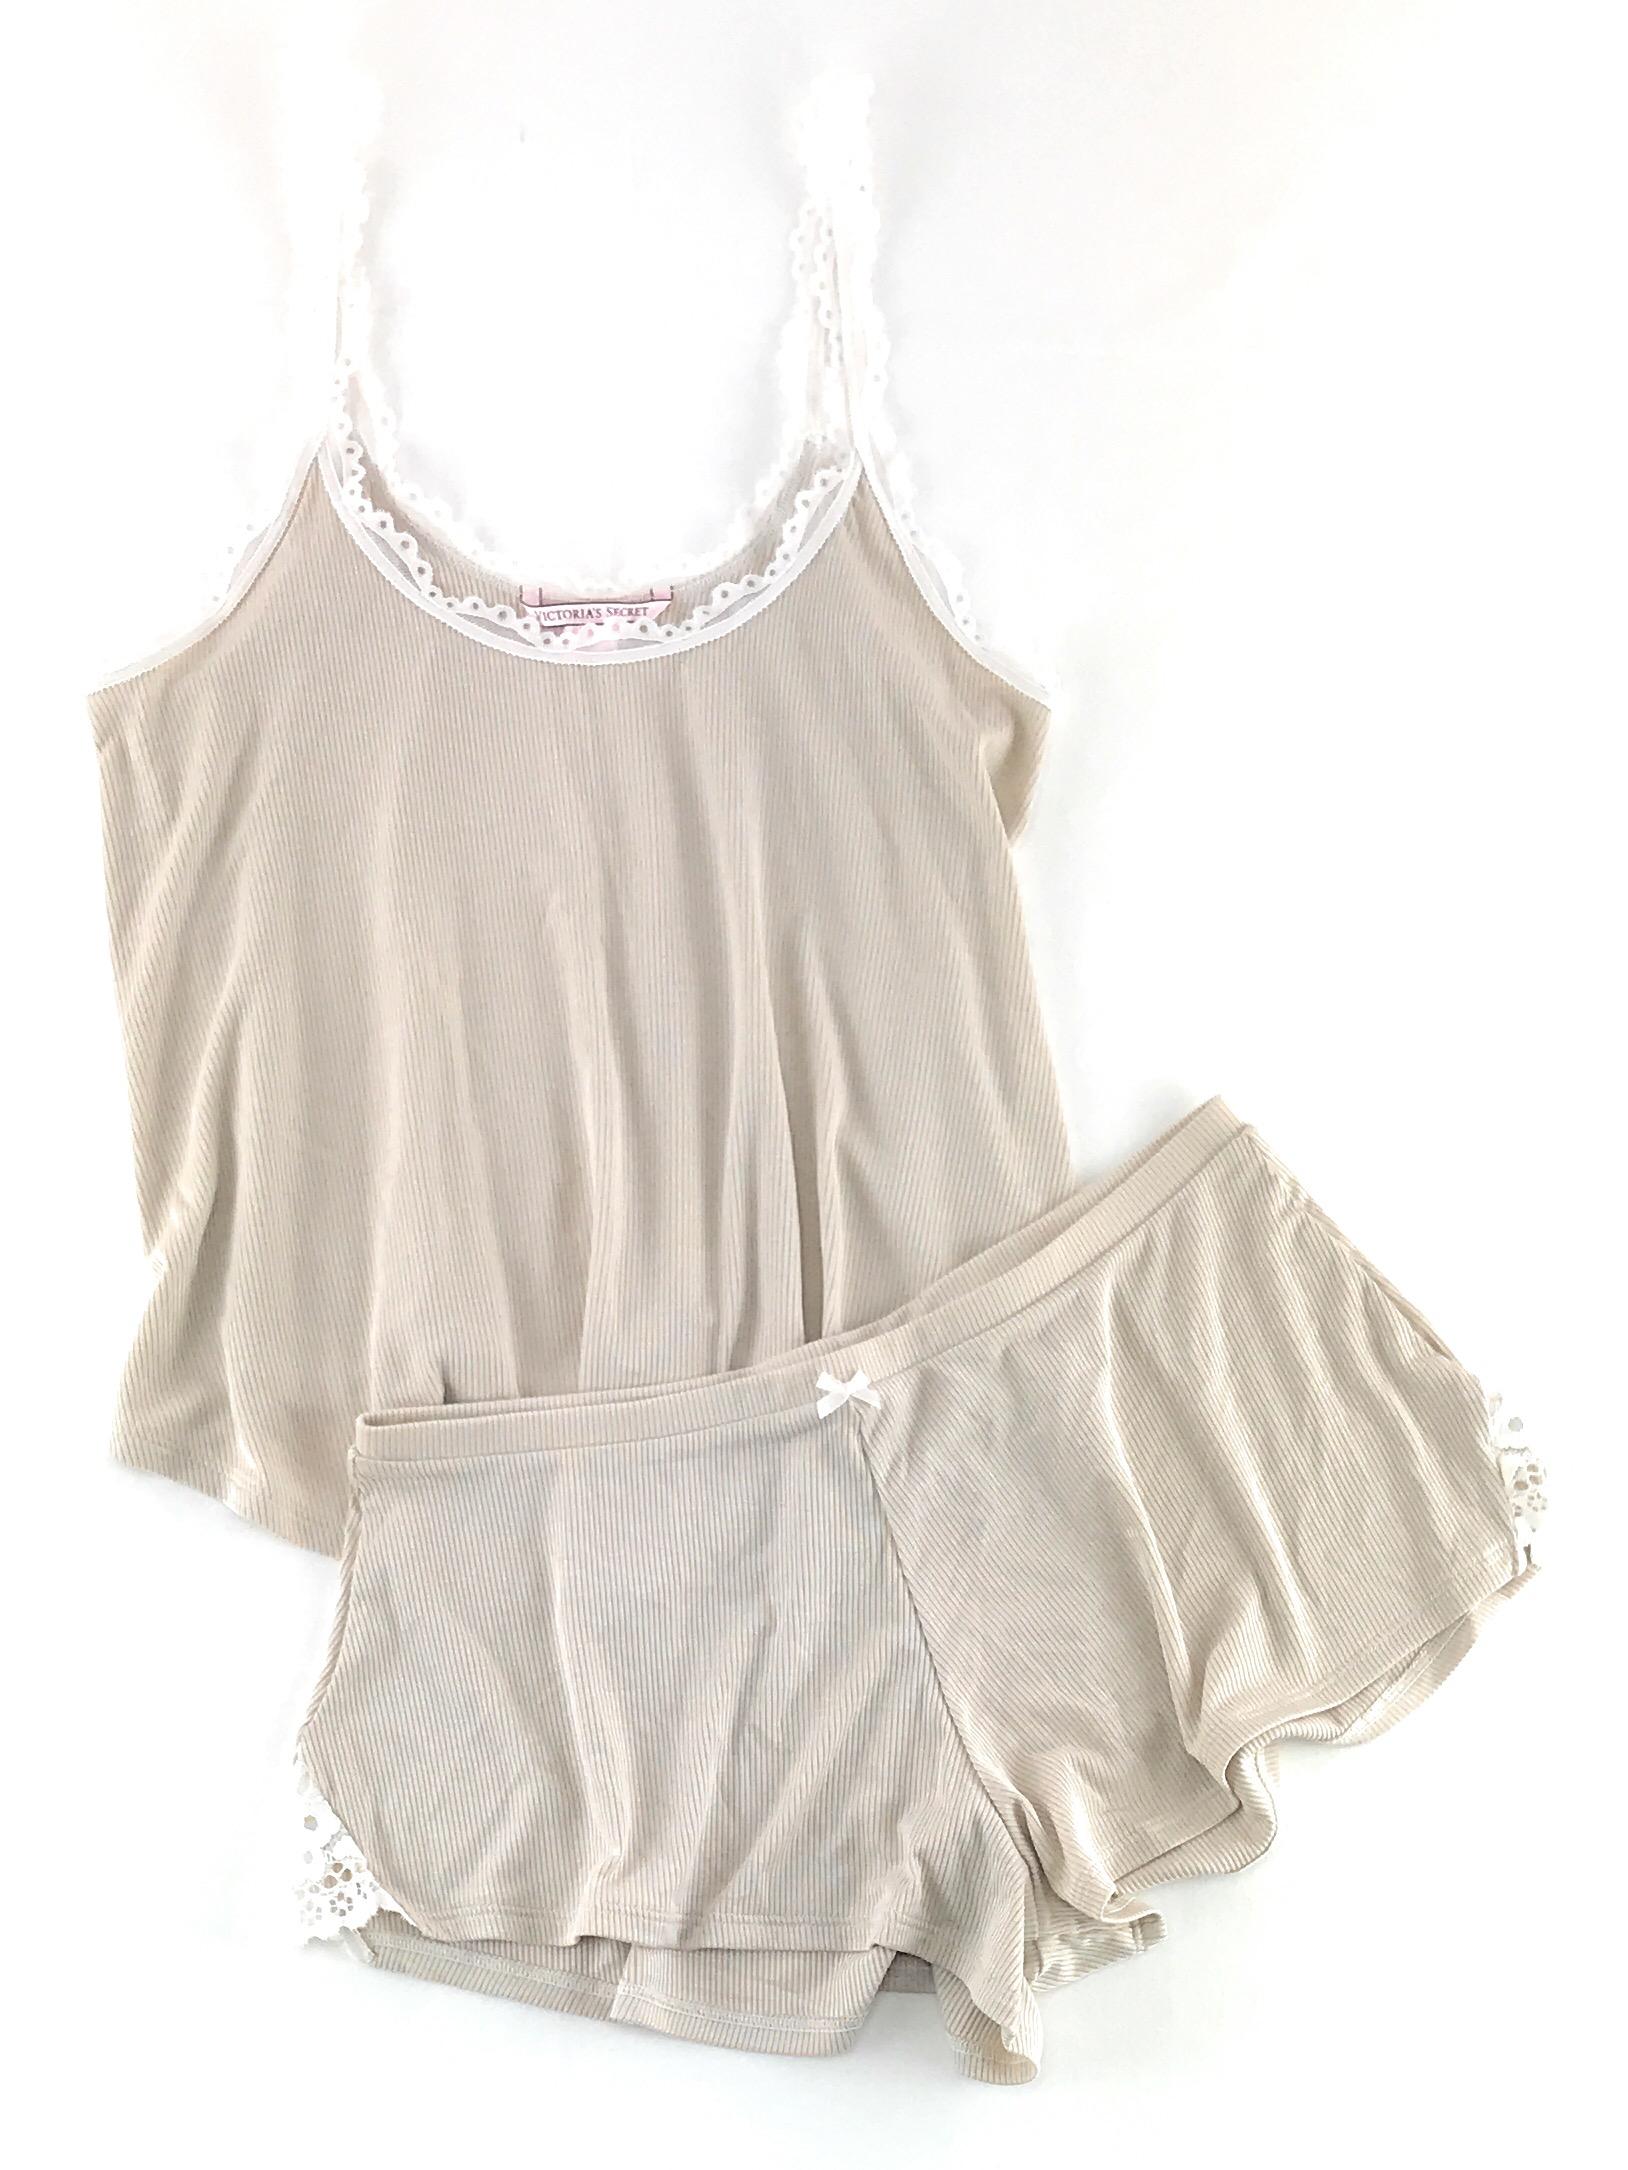 Victoria-039-s-Secret-Pajamas-Set-PJs-2-Piece-Ribbed-Sleep-Cami-Tank-and-Shorts thumbnail 4